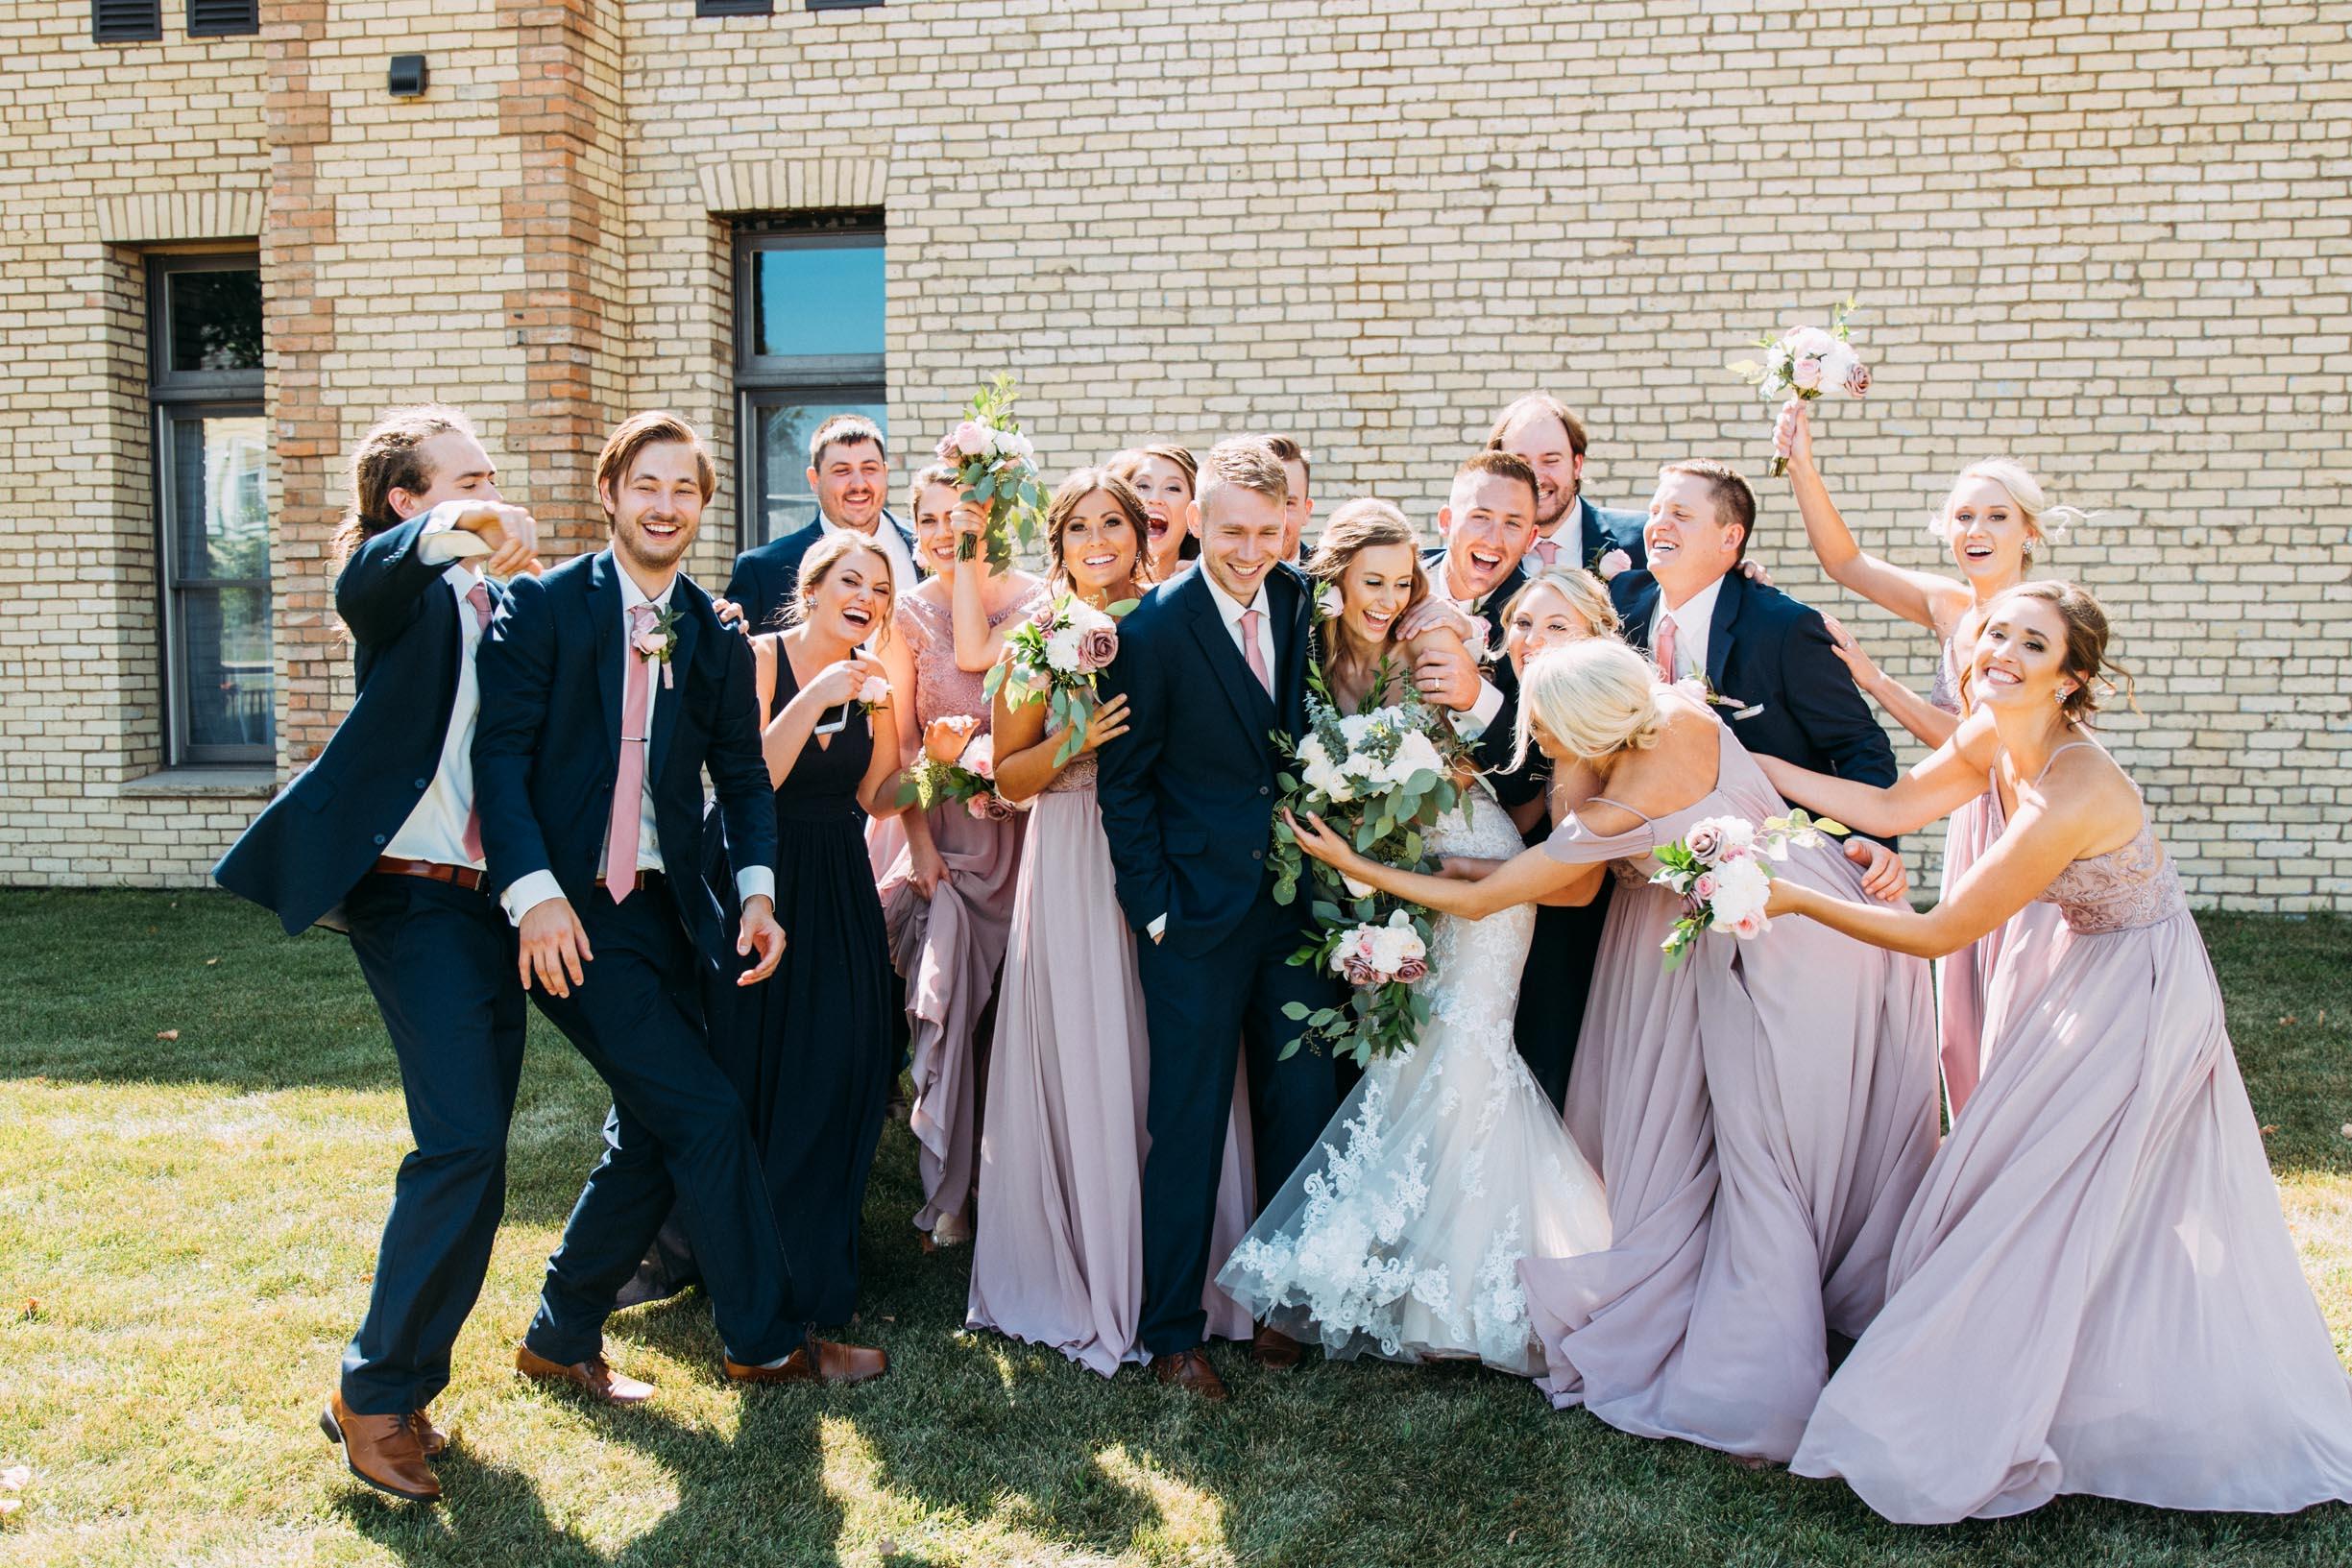 46-WeddingsattheBroz_Minnesota_WeddingBlog_WeddingParty.jpg